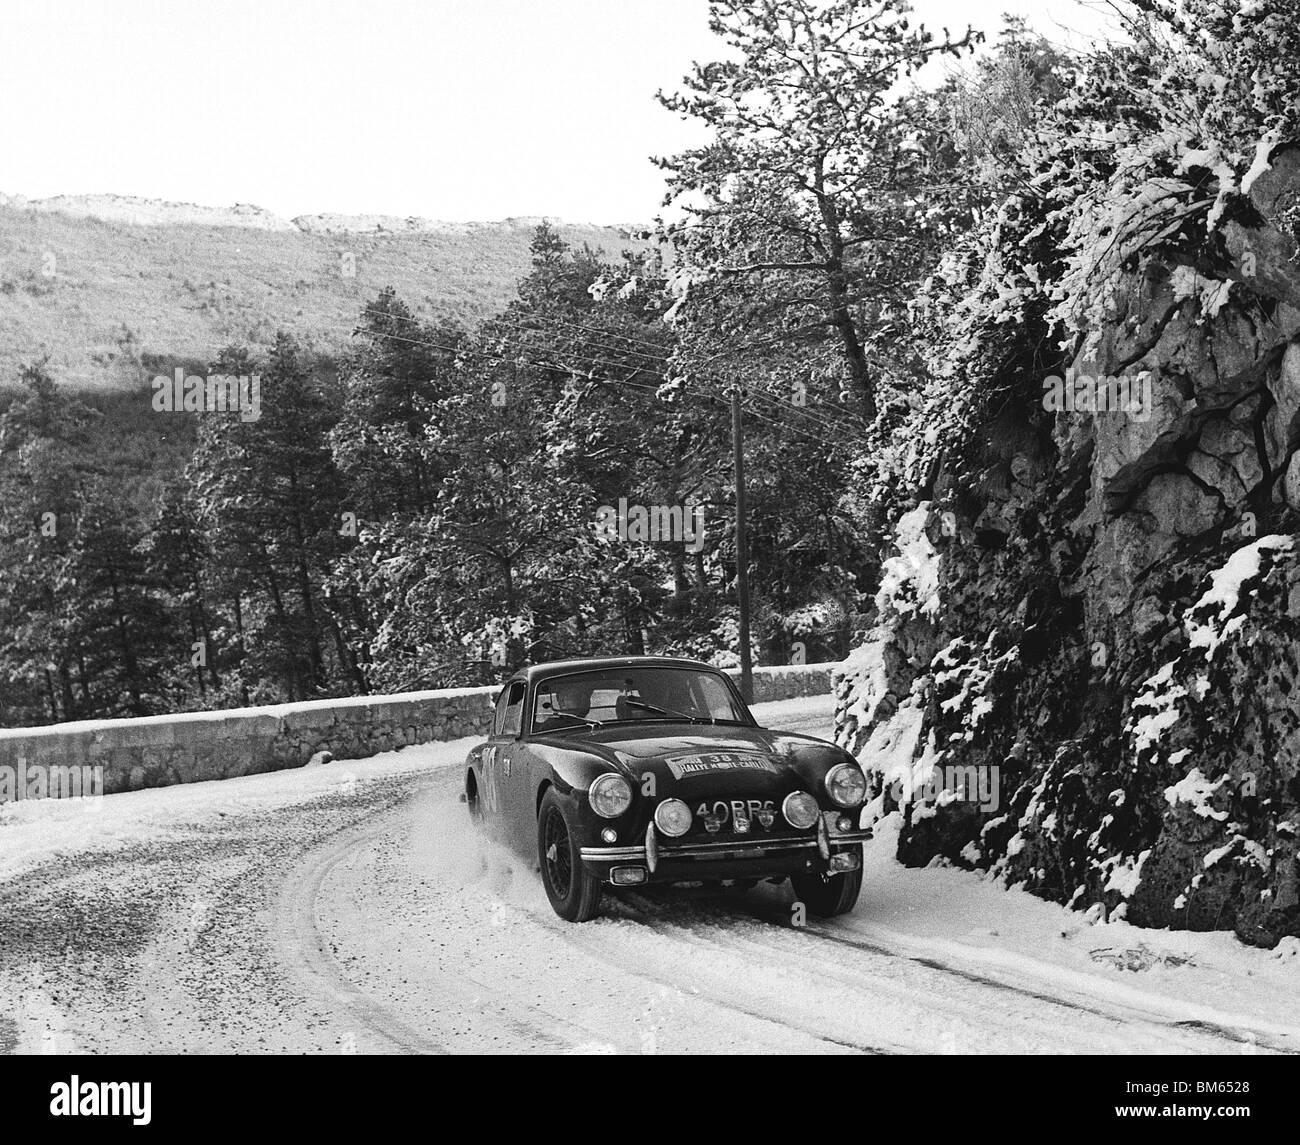 AC Aceca conduit par T. Clarke sur le rallye de Monte Carlo 1958 Photo Stock